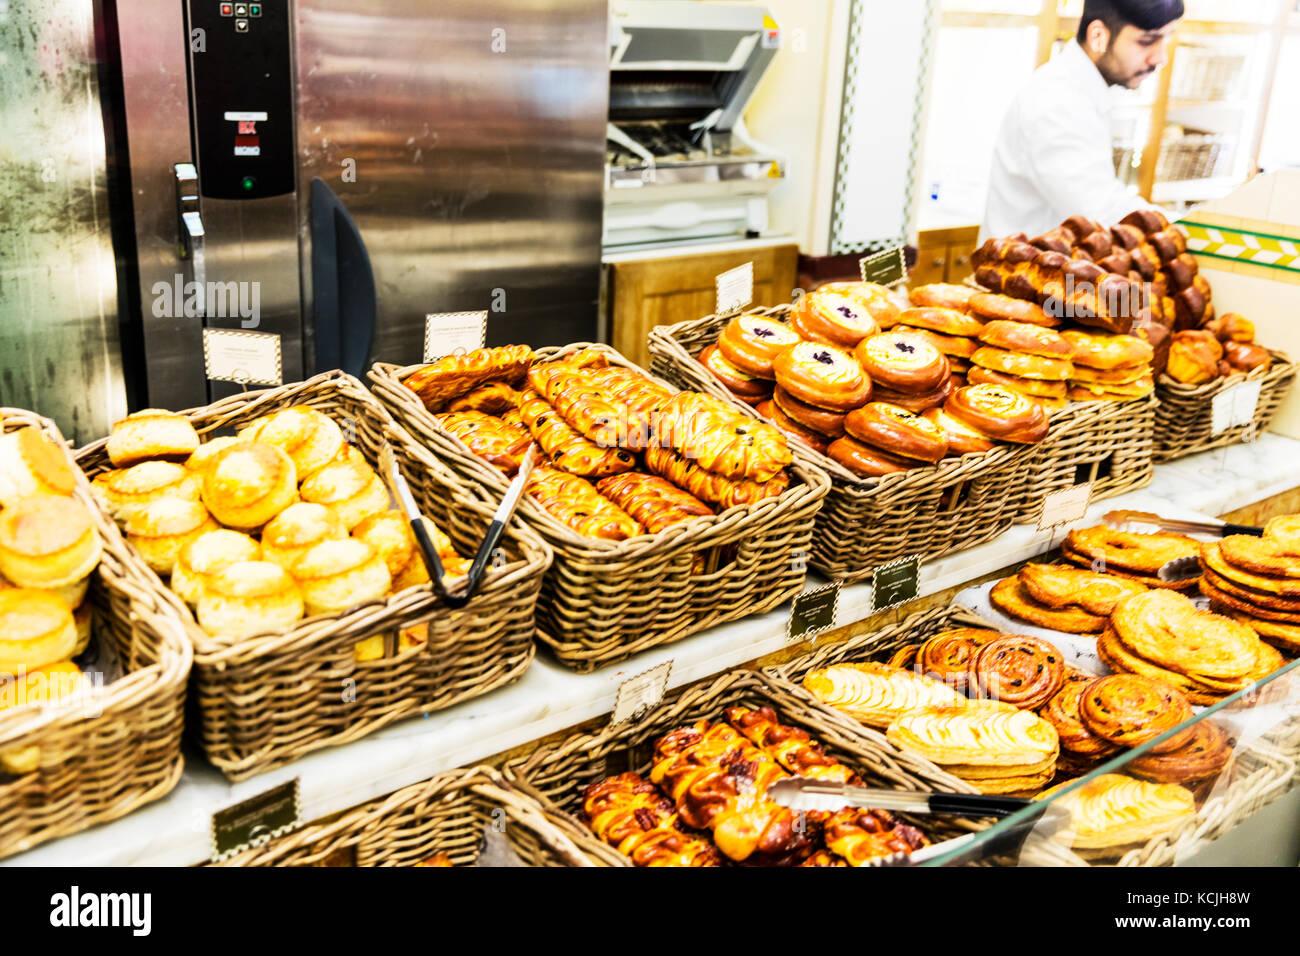 Danish pastries, Bakers display, bakery display, Danishes, Danish pastry, pork pies, patisserie, patisserie display, - Stock Image